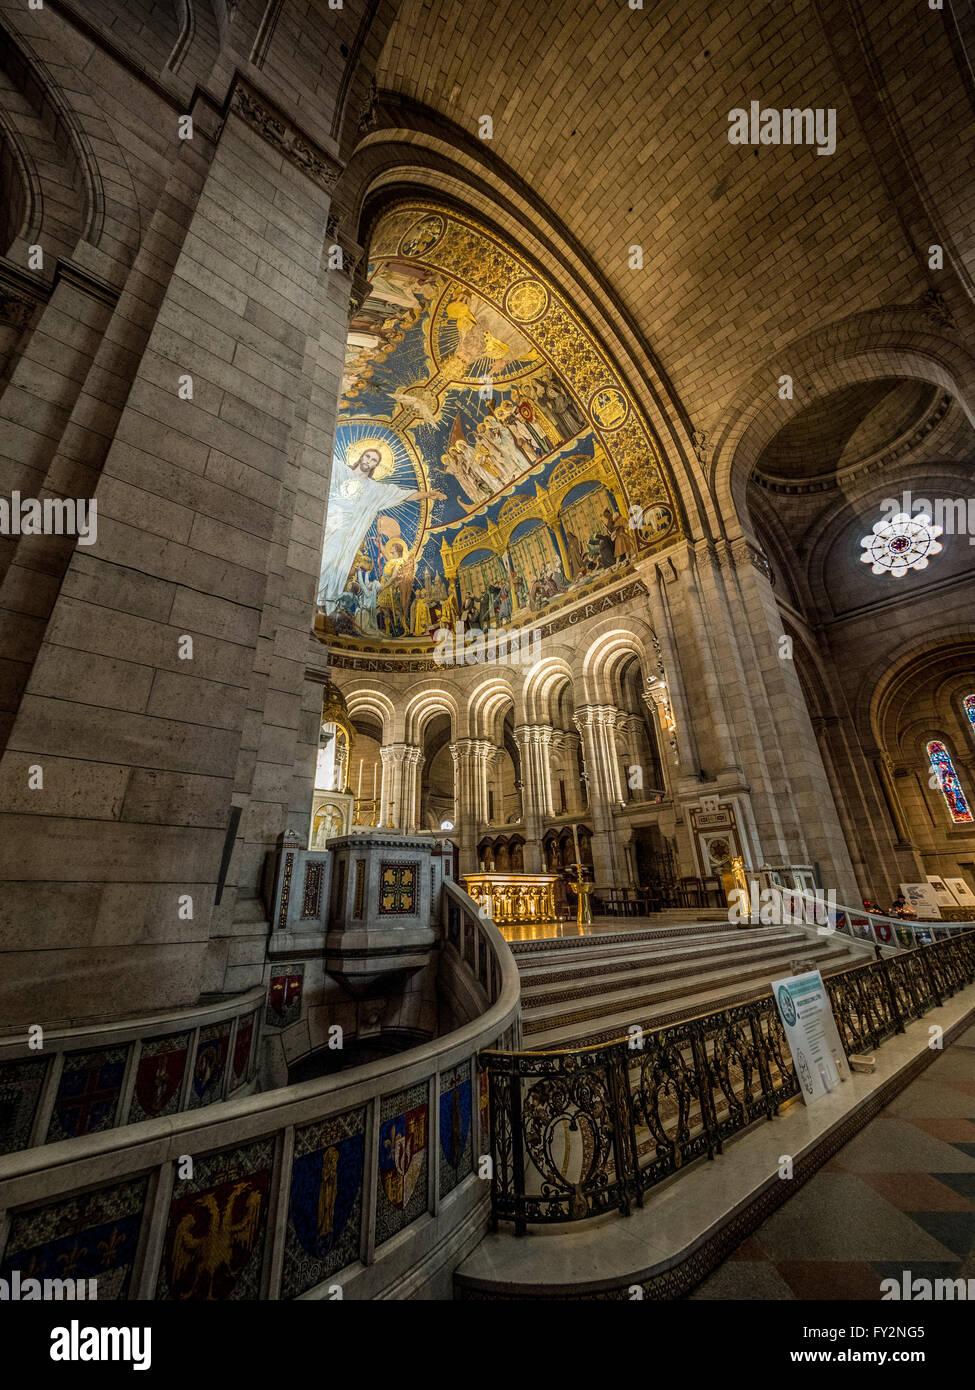 The Basilica of the Sacred Heart of Paris, commonly known as Sacré-Cœur Basilica and often simply Sacré-Cœur Stock Photo